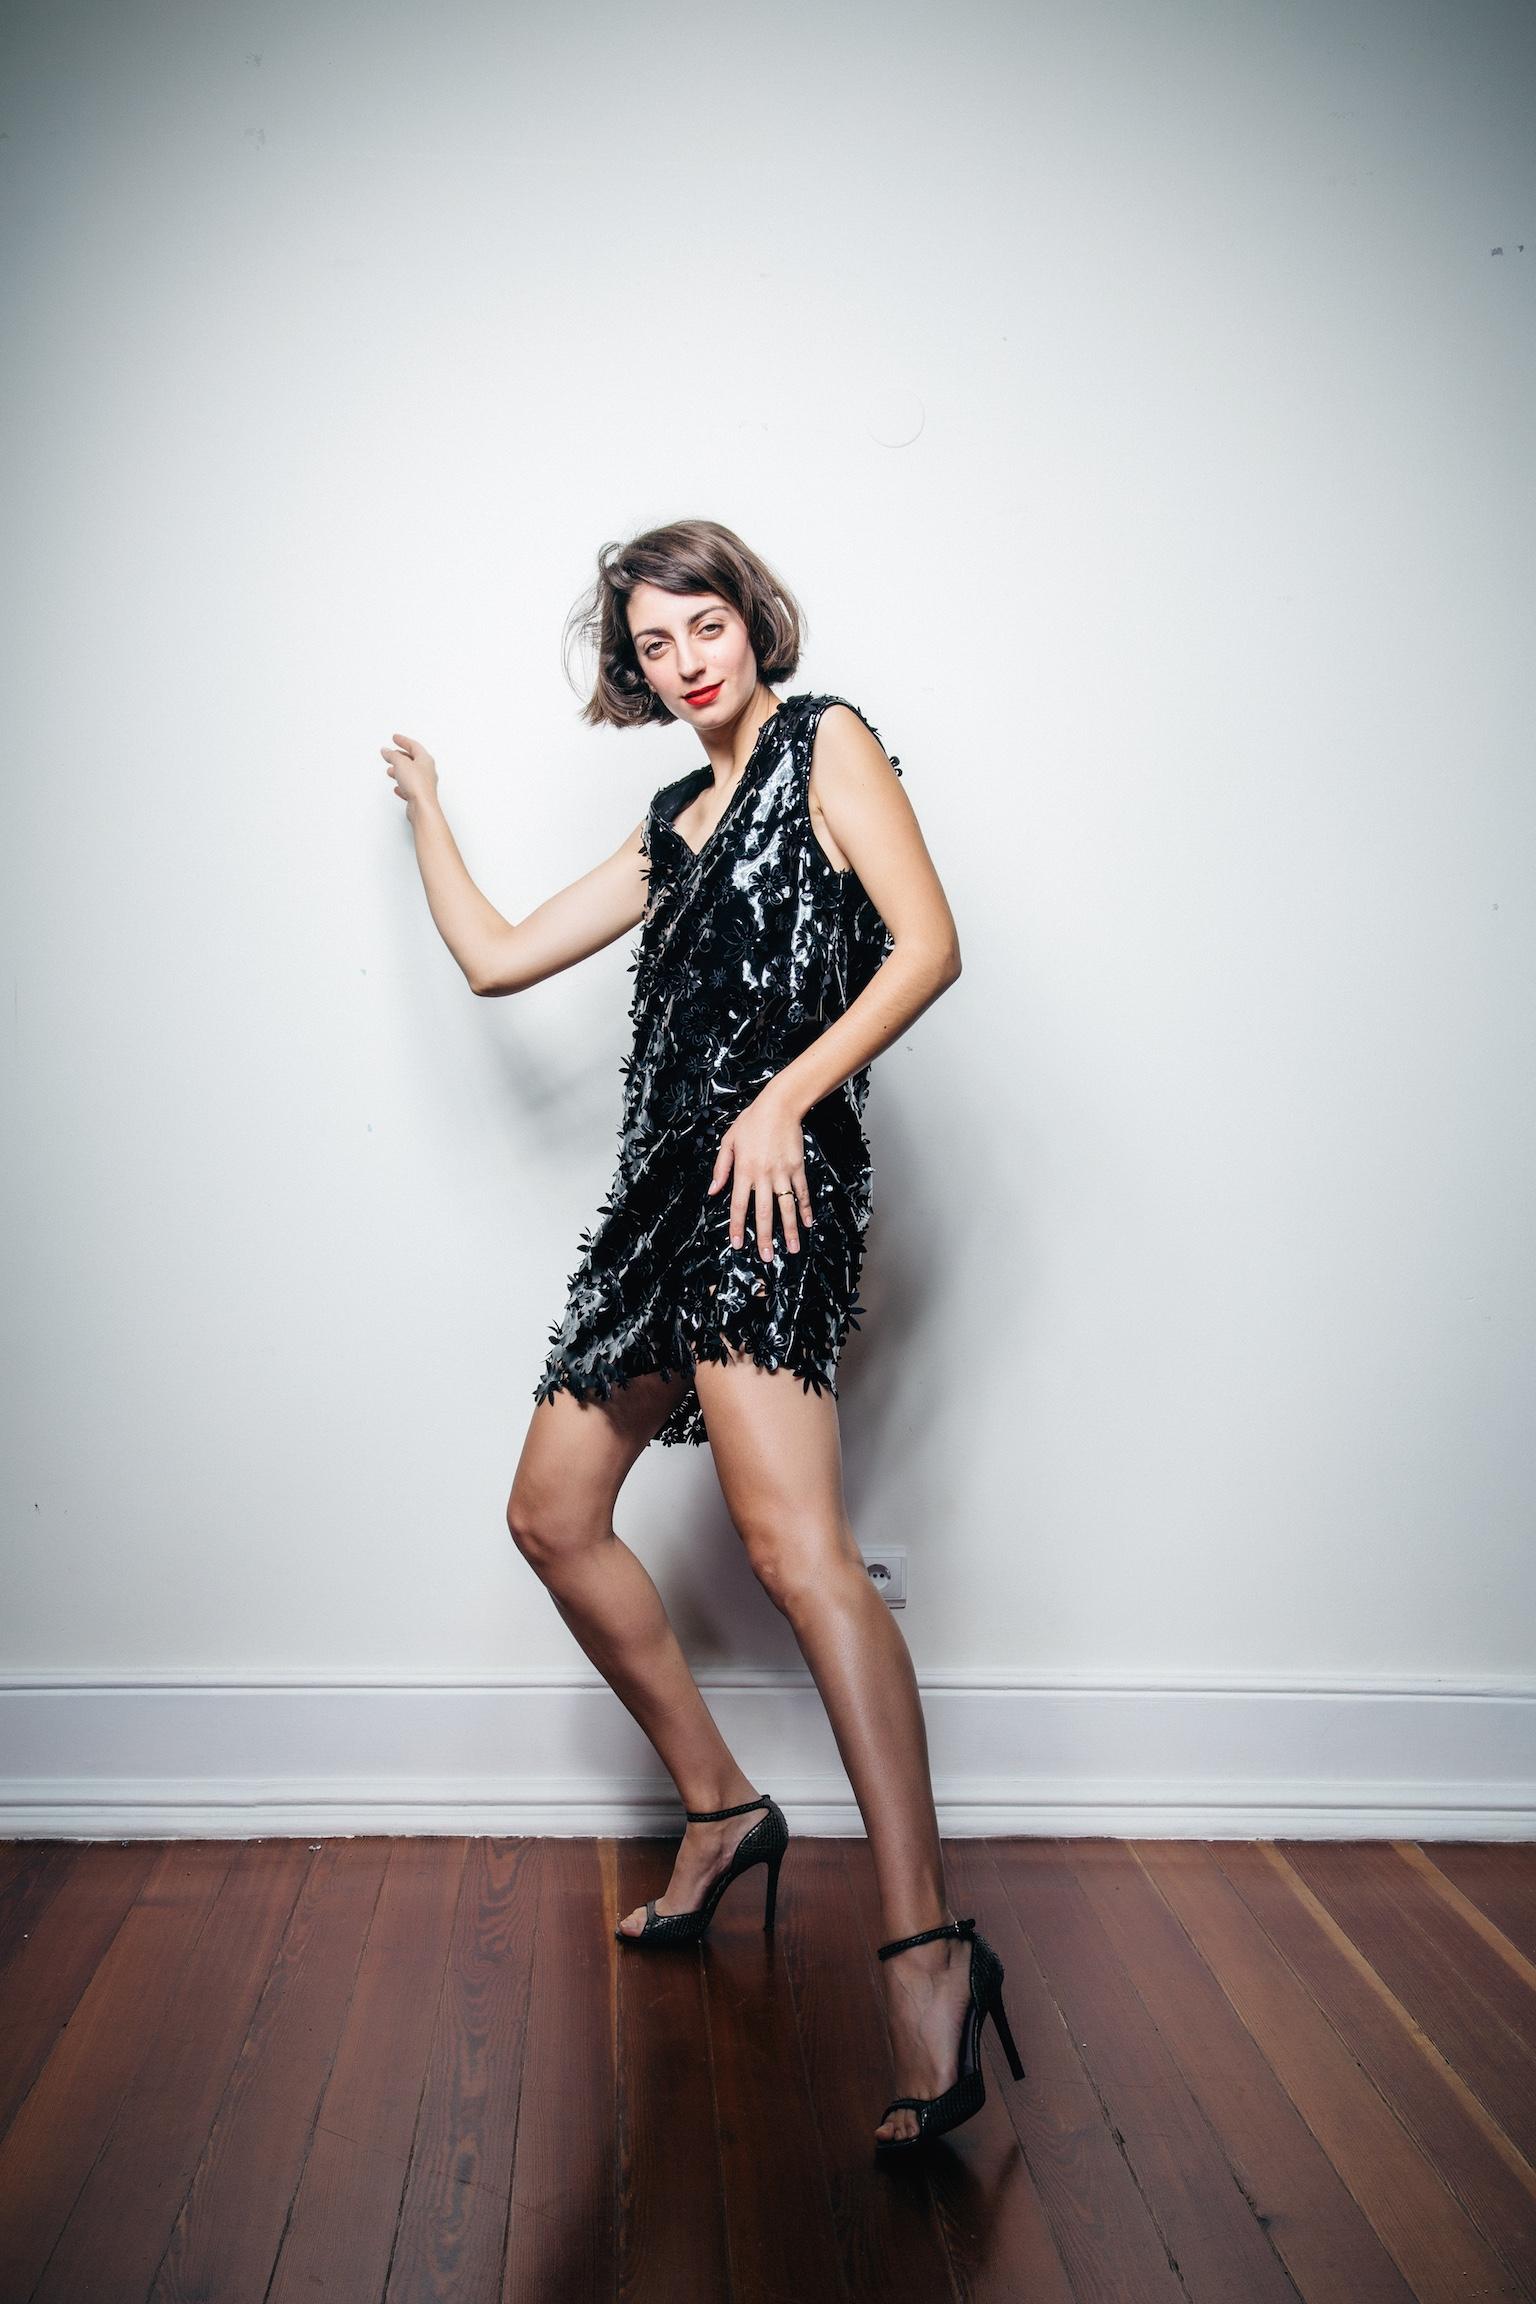 Joana Barrios, blog Trashédia